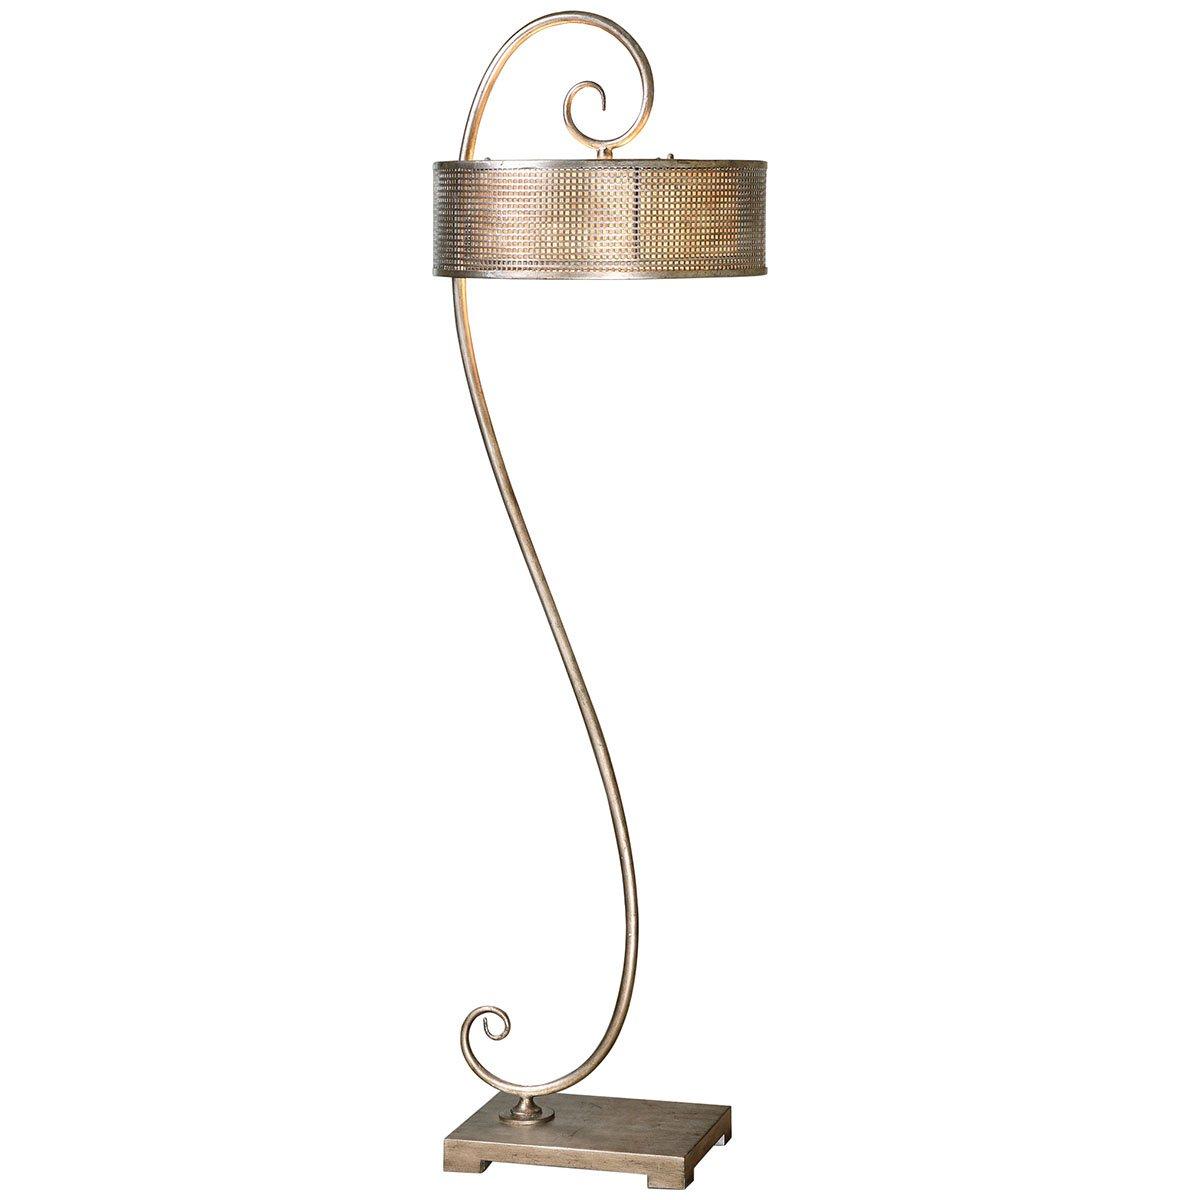 Amazon.com: Uttermost 28599 Dalou Scroll Floor Lamp, Silver: Home U0026 Kitchen